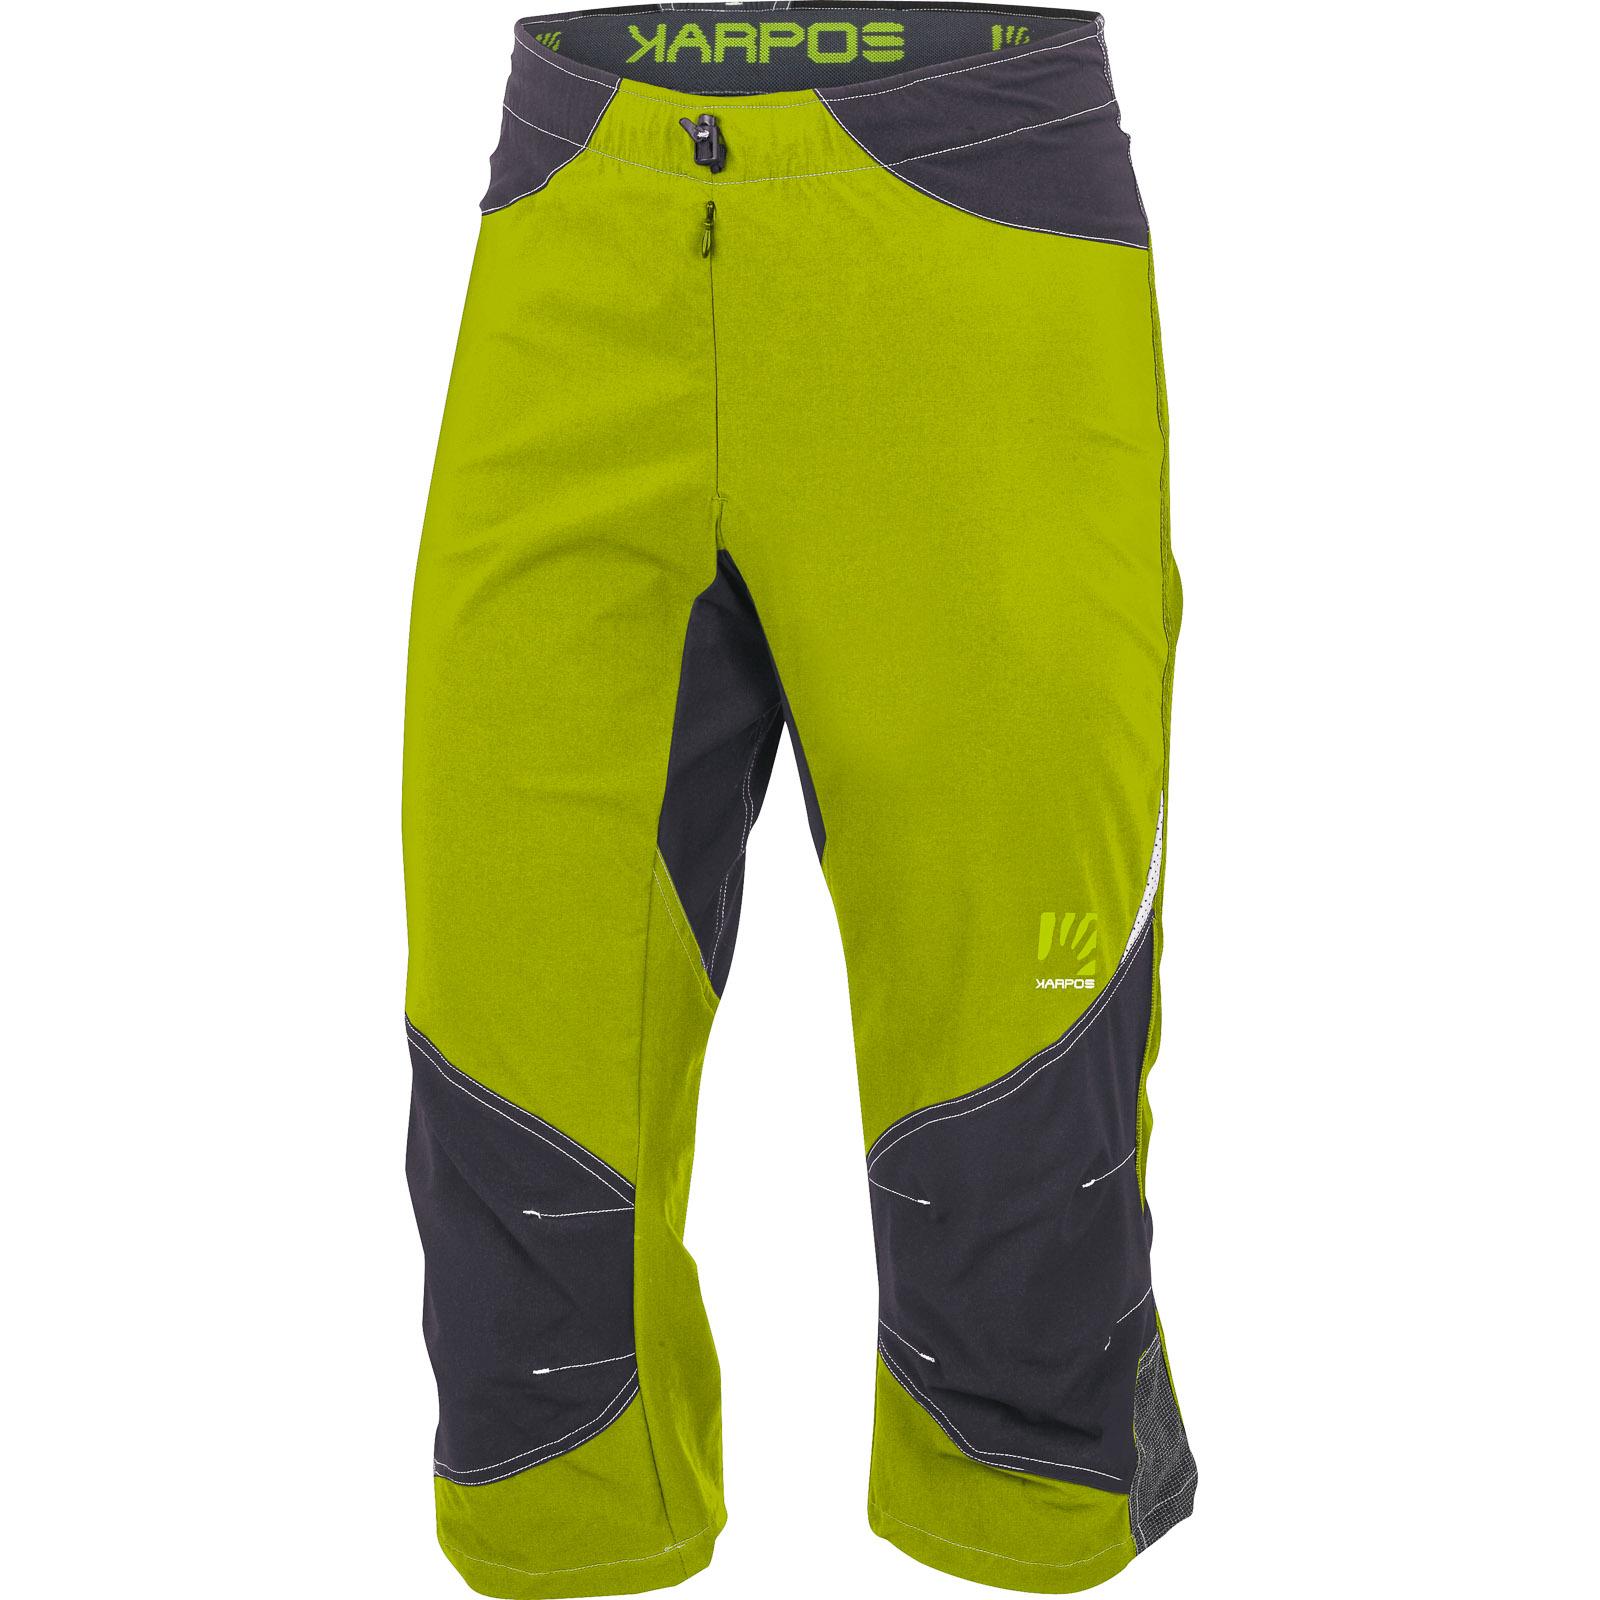 930eda7f8 Karpos CLIFF 3/4 nohavice svetlozelené/antracit